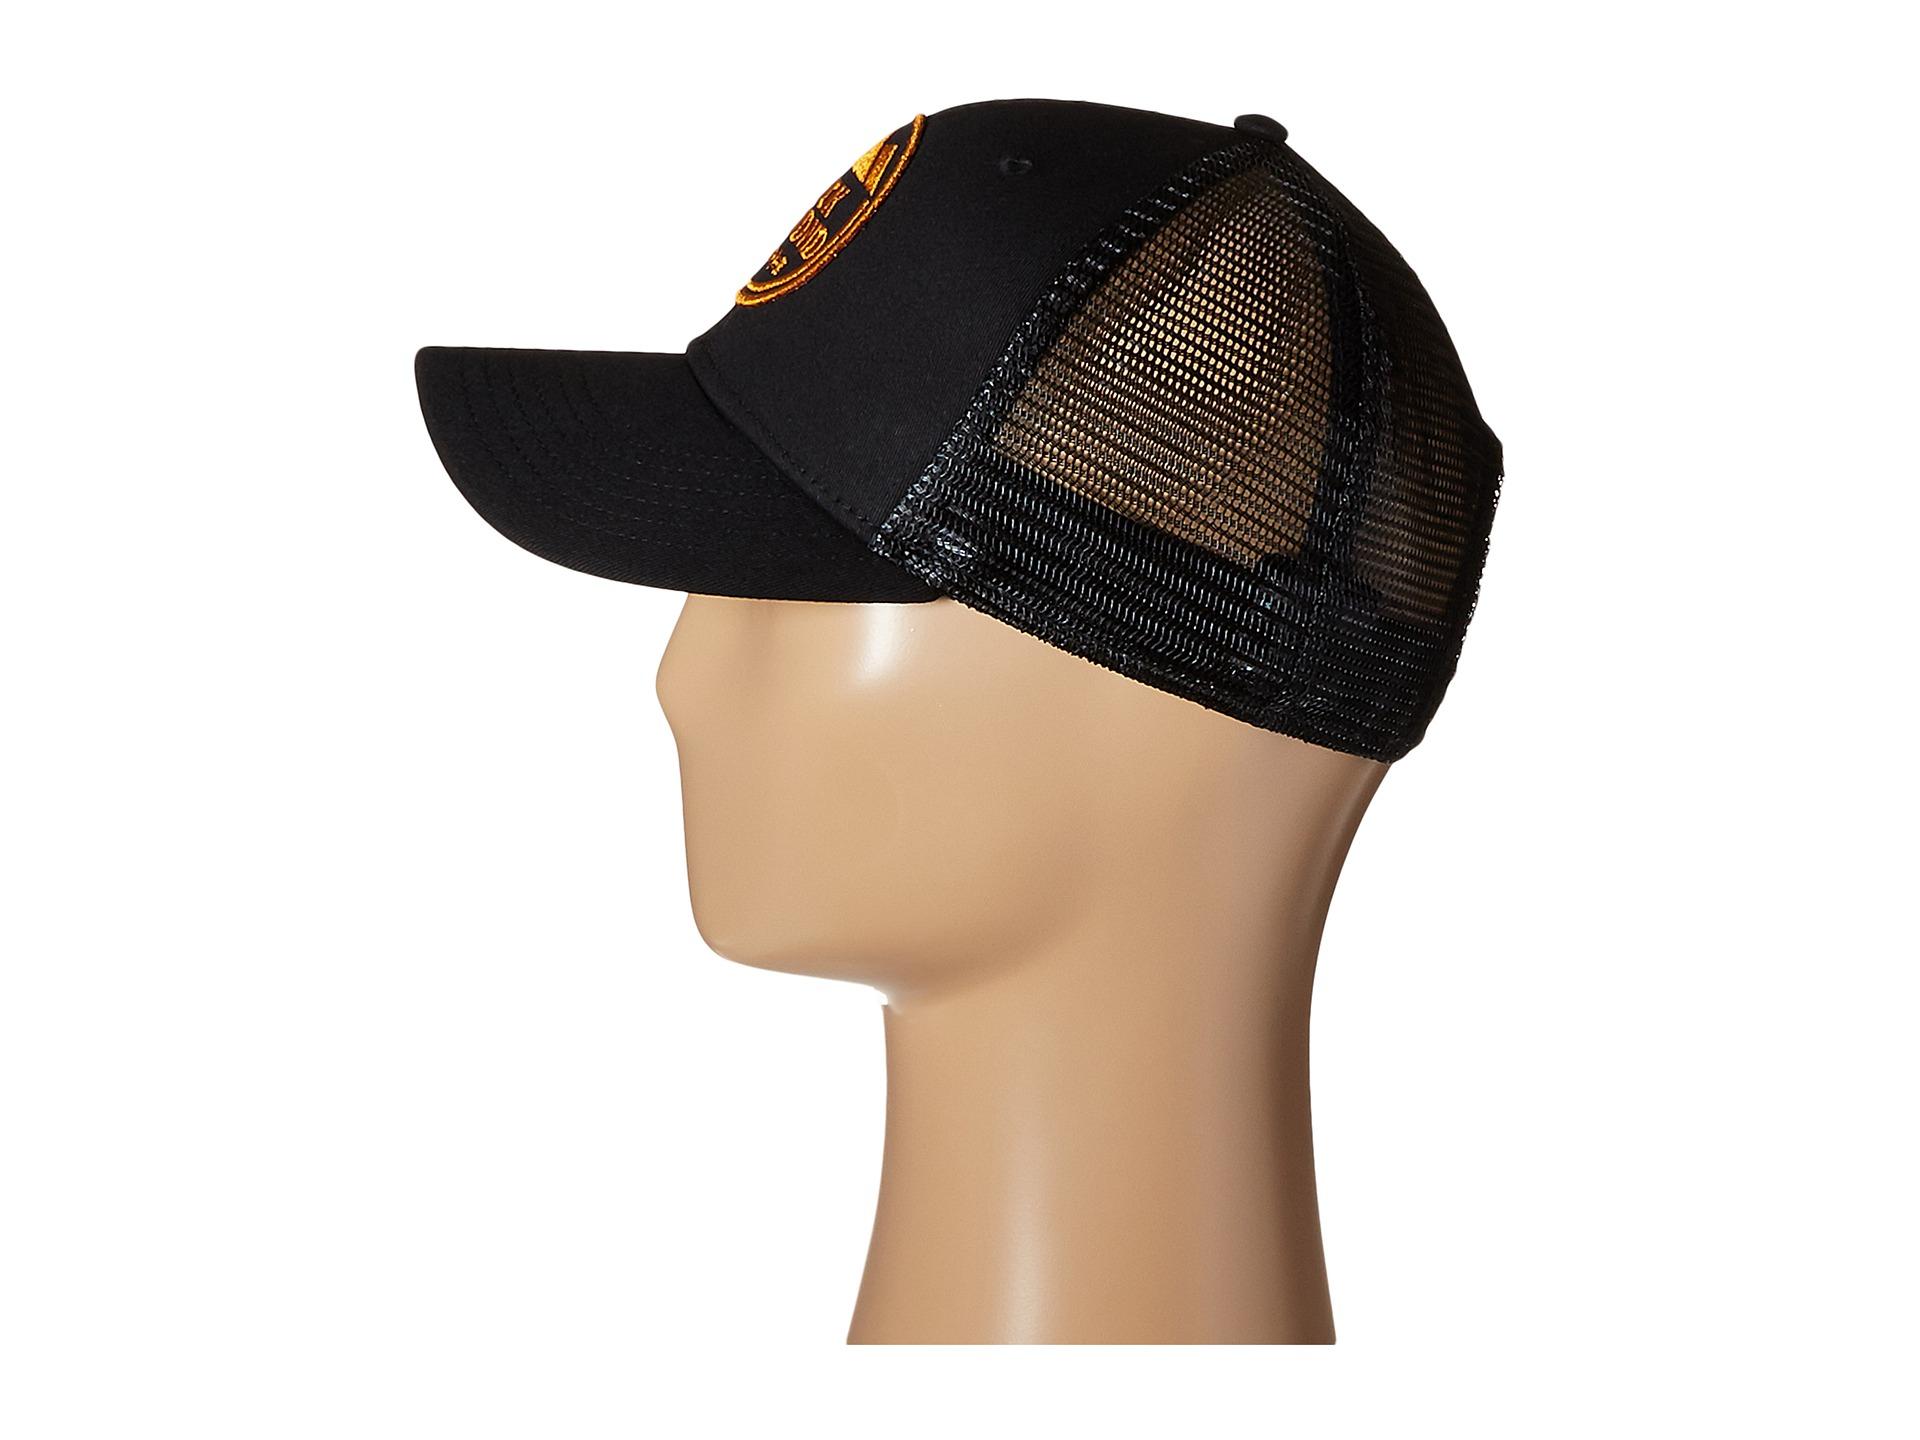 e8ee8ca1bc0 Lyst - Black Diamond Bd Trucker Hat in Black for Men